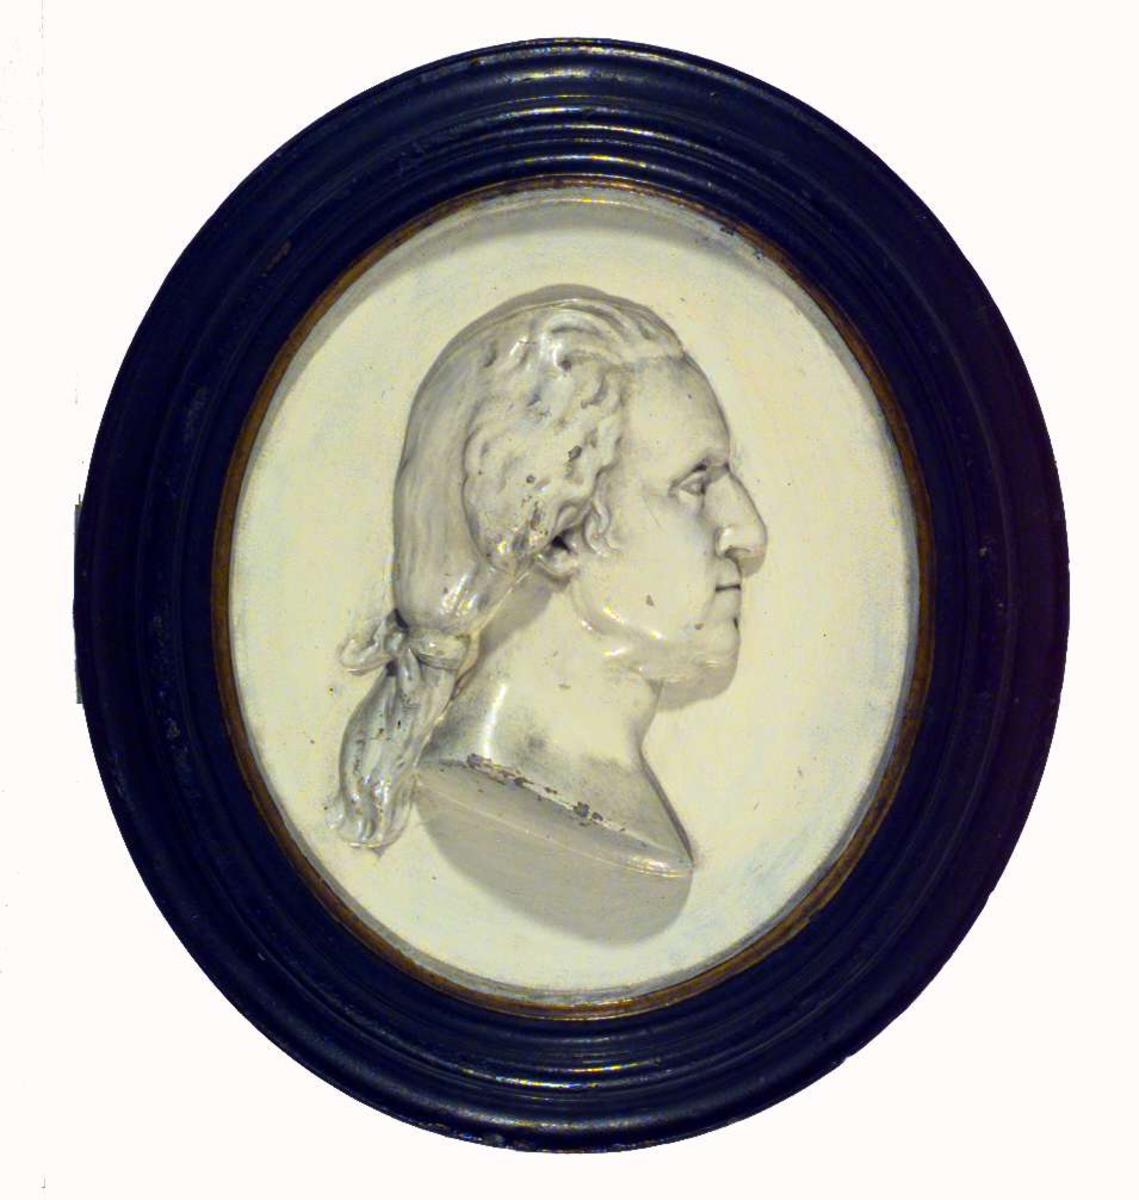 Et mannshode i relieff, sannsynligvis Carl von Linné.